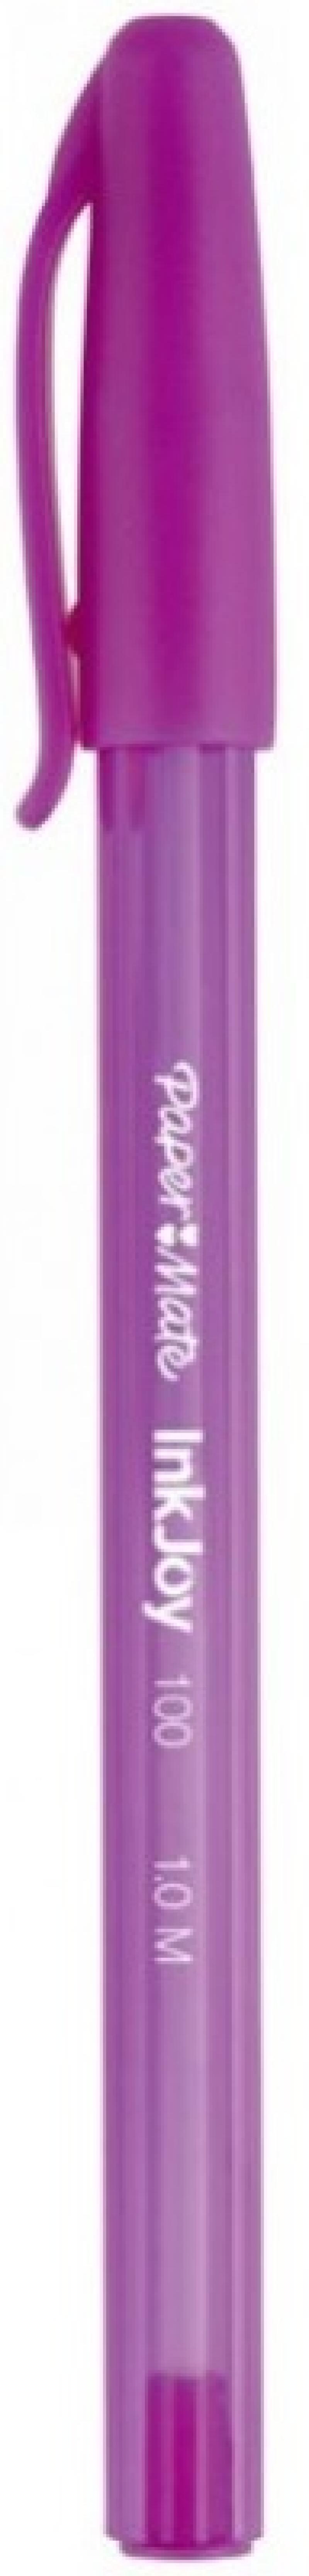 Шариковая ручка Paper Mate InkJoy 100 розовый 1 мм PM-S0977320 PM-S0977320